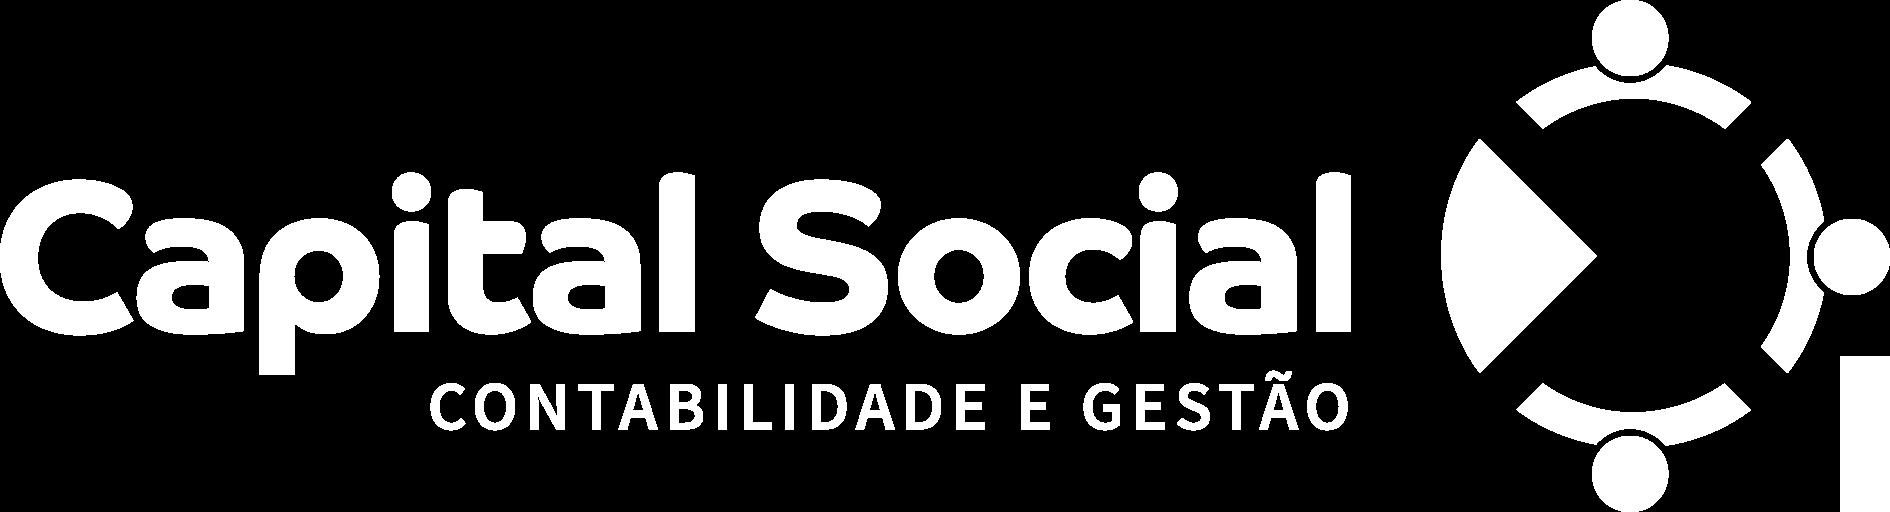 Staff On Demand - Capital Social